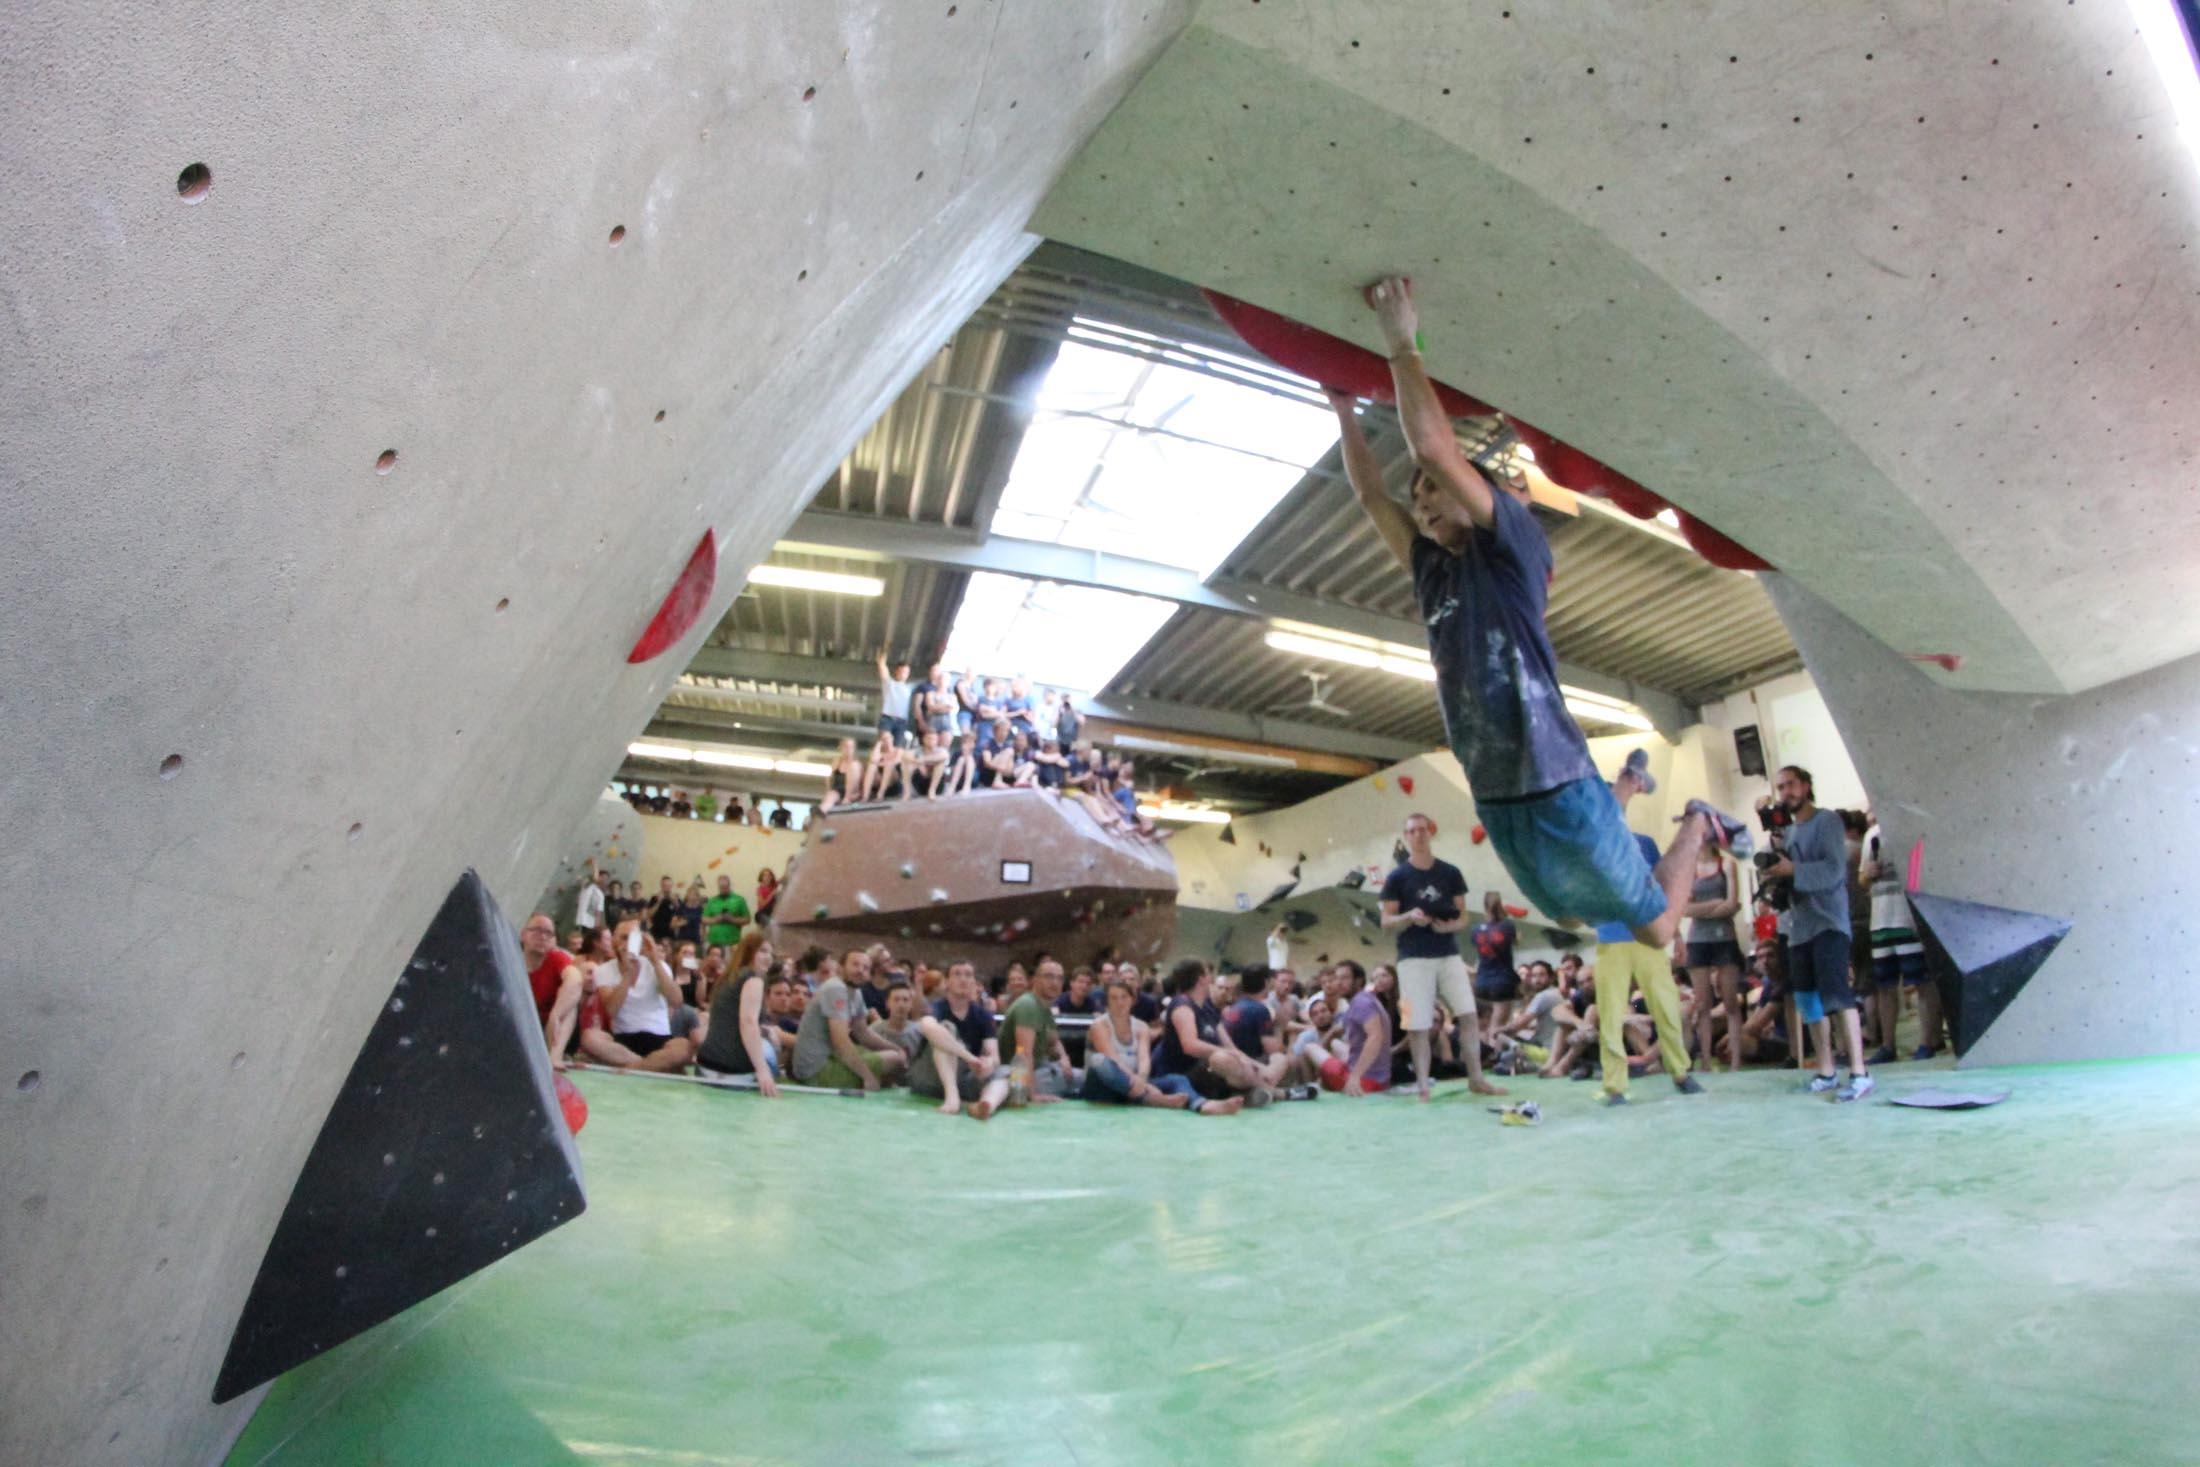 Finale, internationaler bouldercup Frankenjura 2016, BLOCKHELDEN Erlangen, Mammut, Bergfreunde.de, Boulderwettkampf07092016615